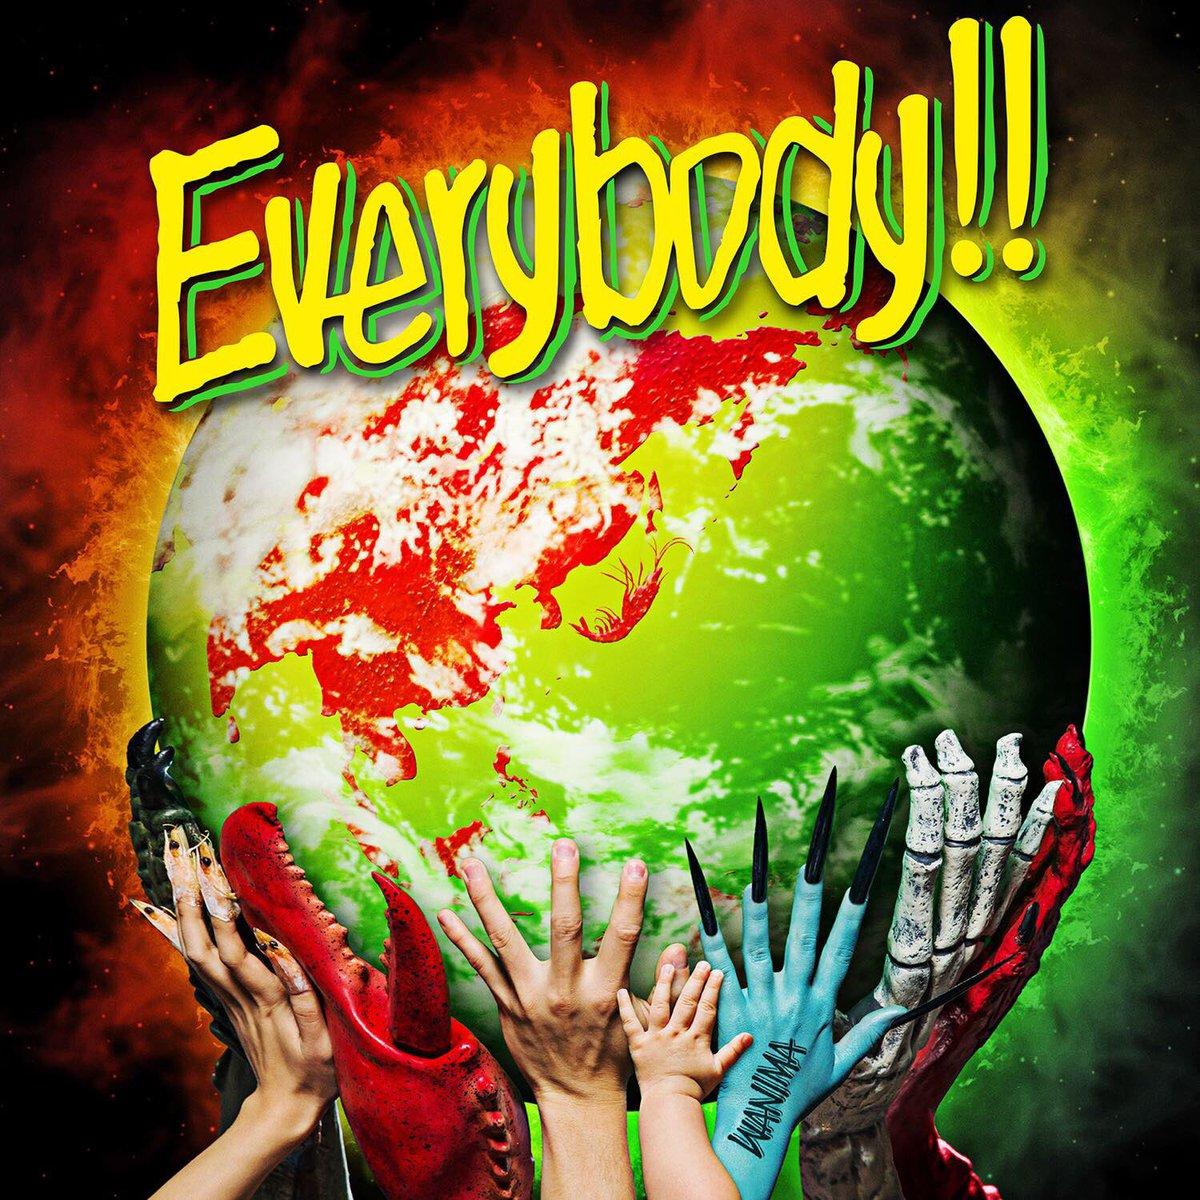 【Everybody‼︎】  2018年1月17日(イイナの日)に発売のフルアルバム‼︎  『Eve…